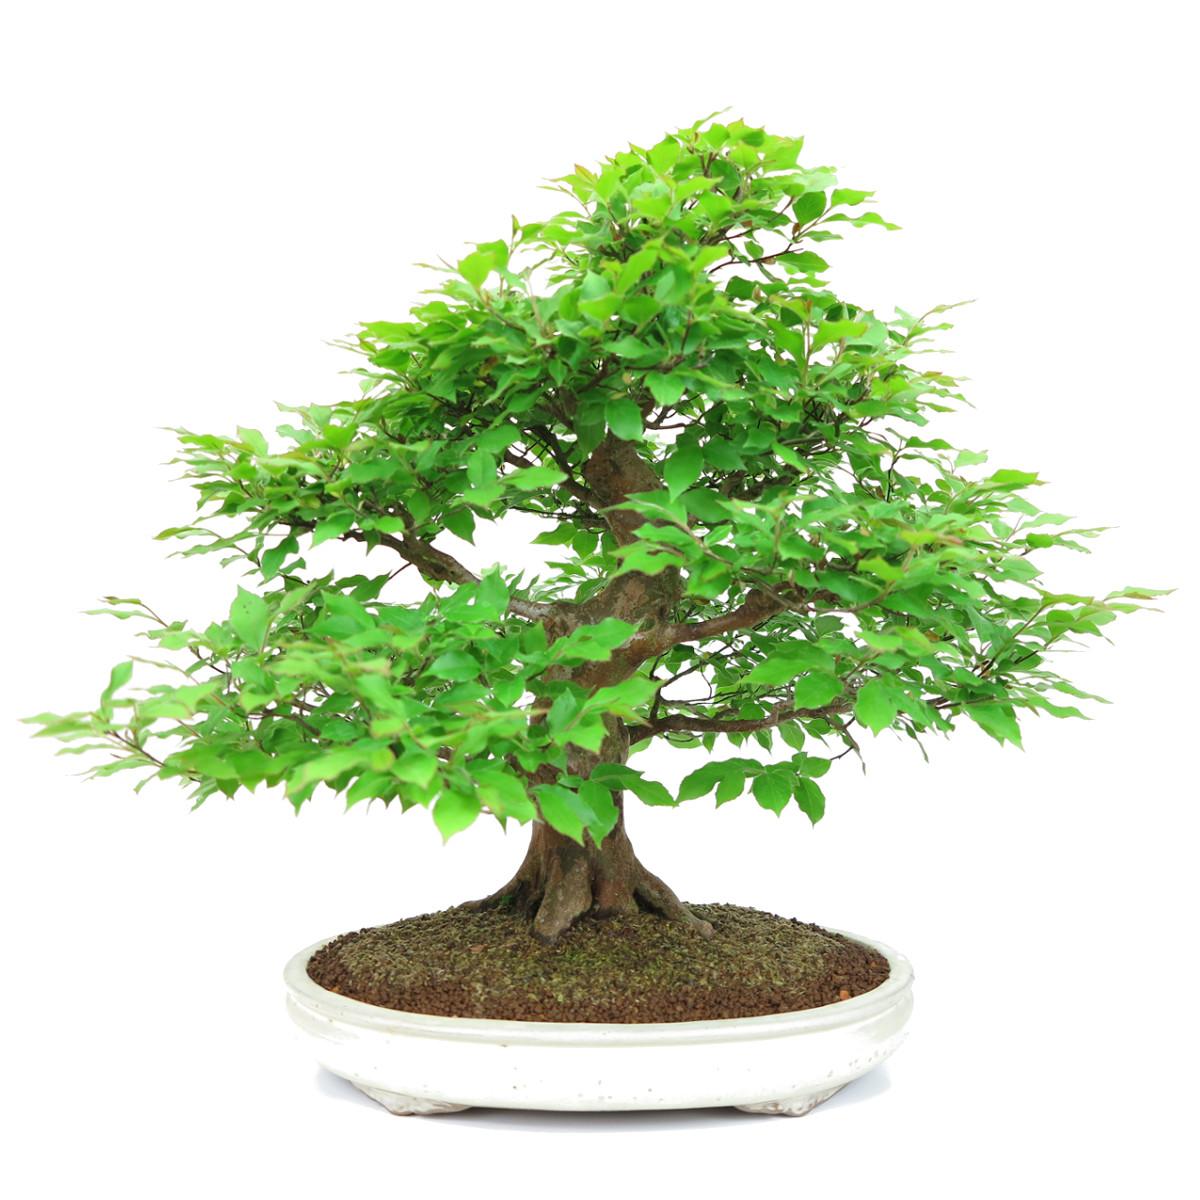 http://bonsai-shohin.com/wp-content/uploads/2017/05/stewartia.jpg